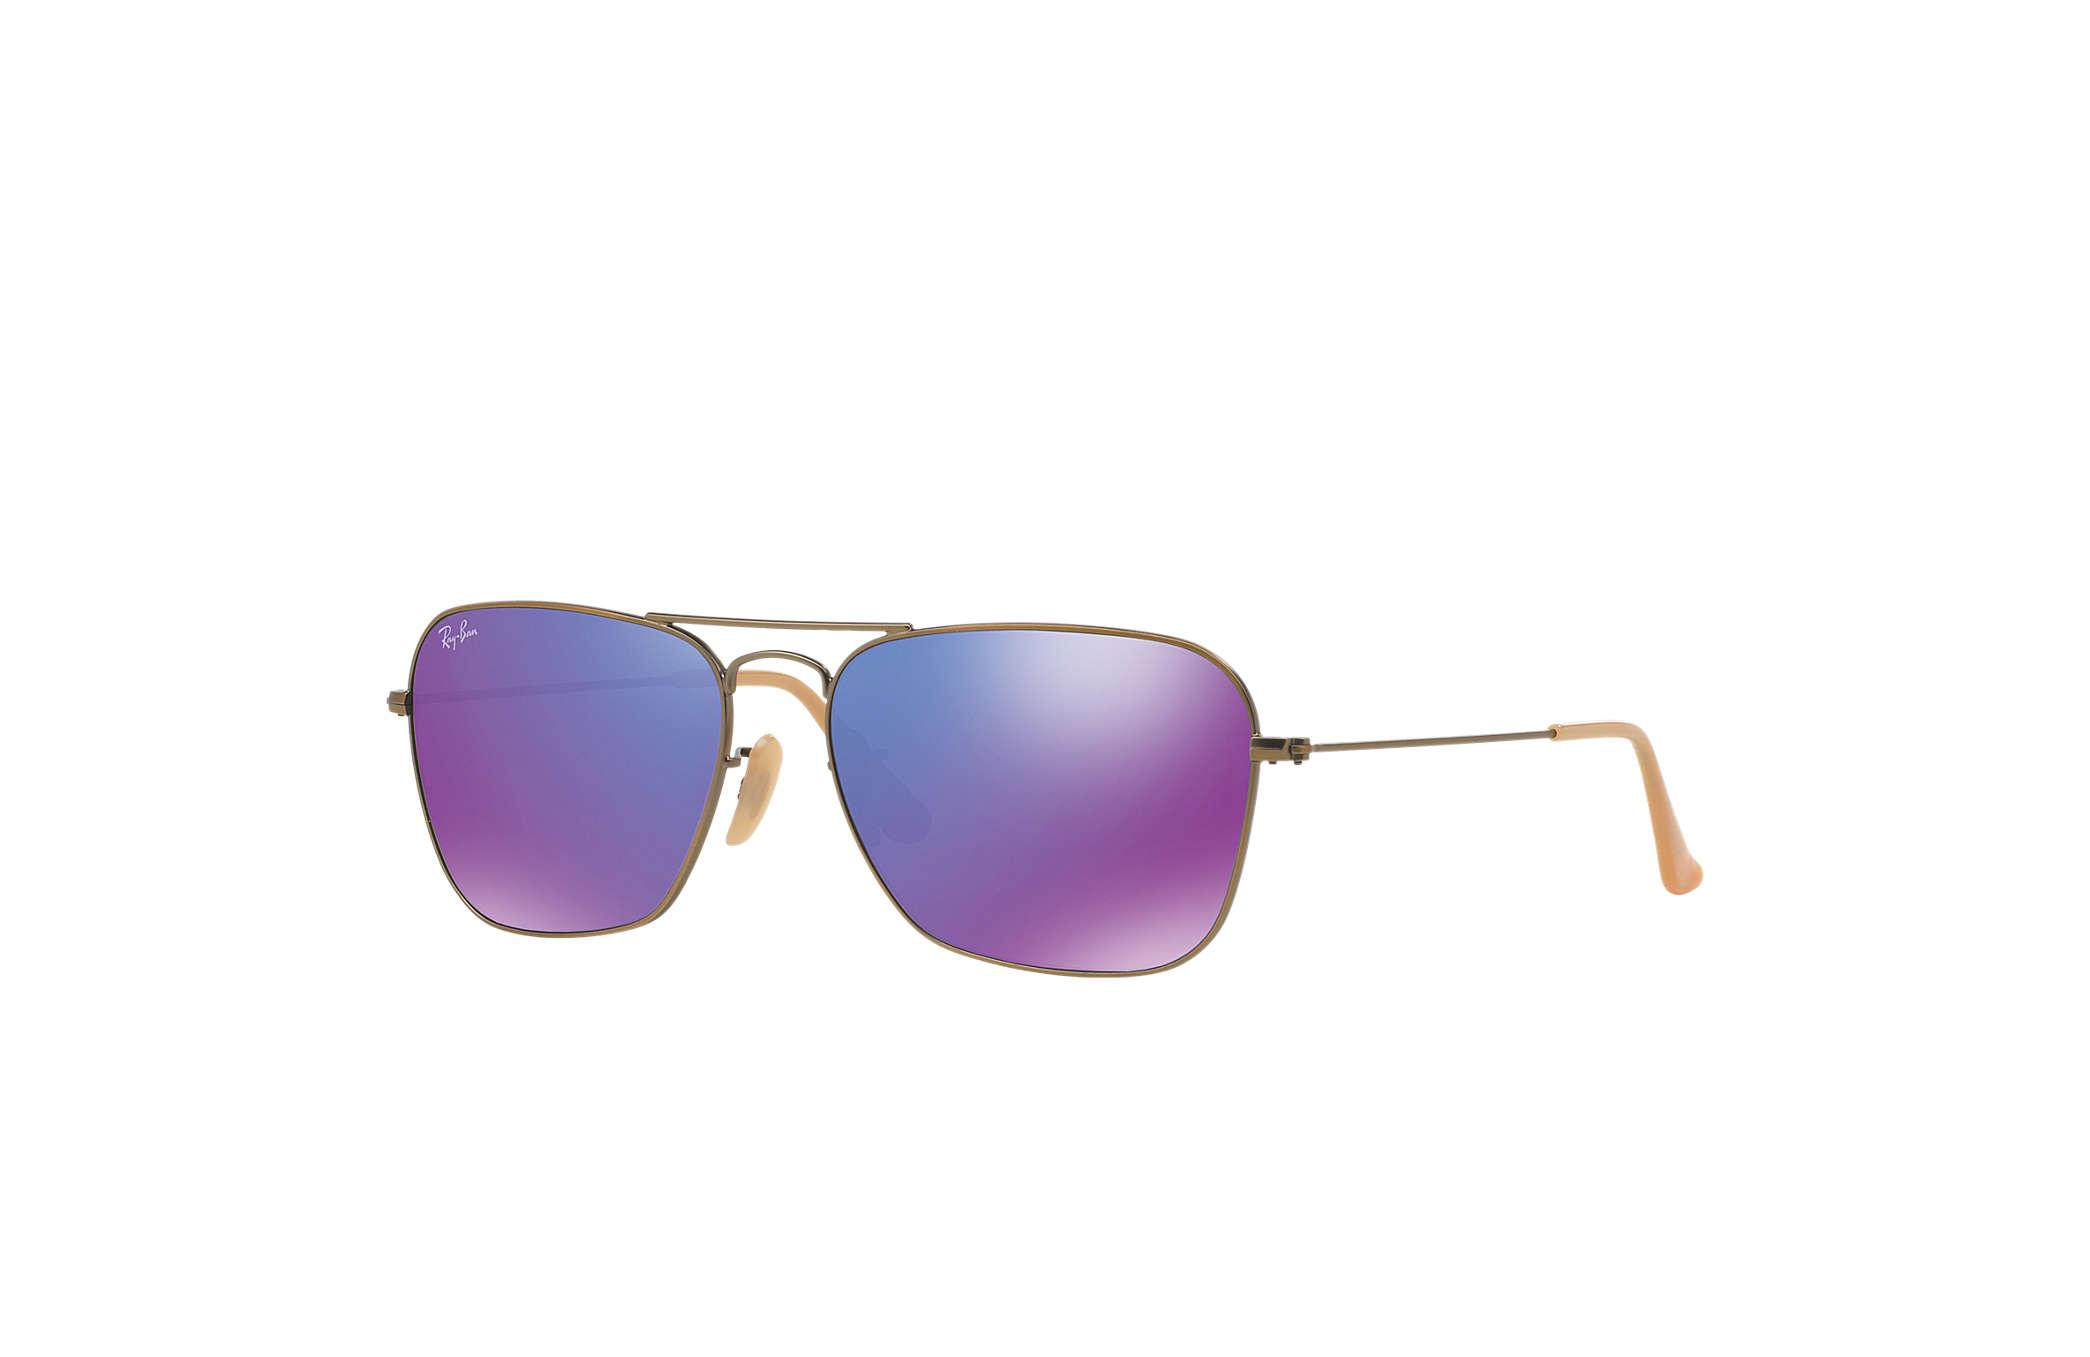 d964a03326e Ray Ban Caravan Arista Frame Green Lens Sunglasses RB3136 001 58 15